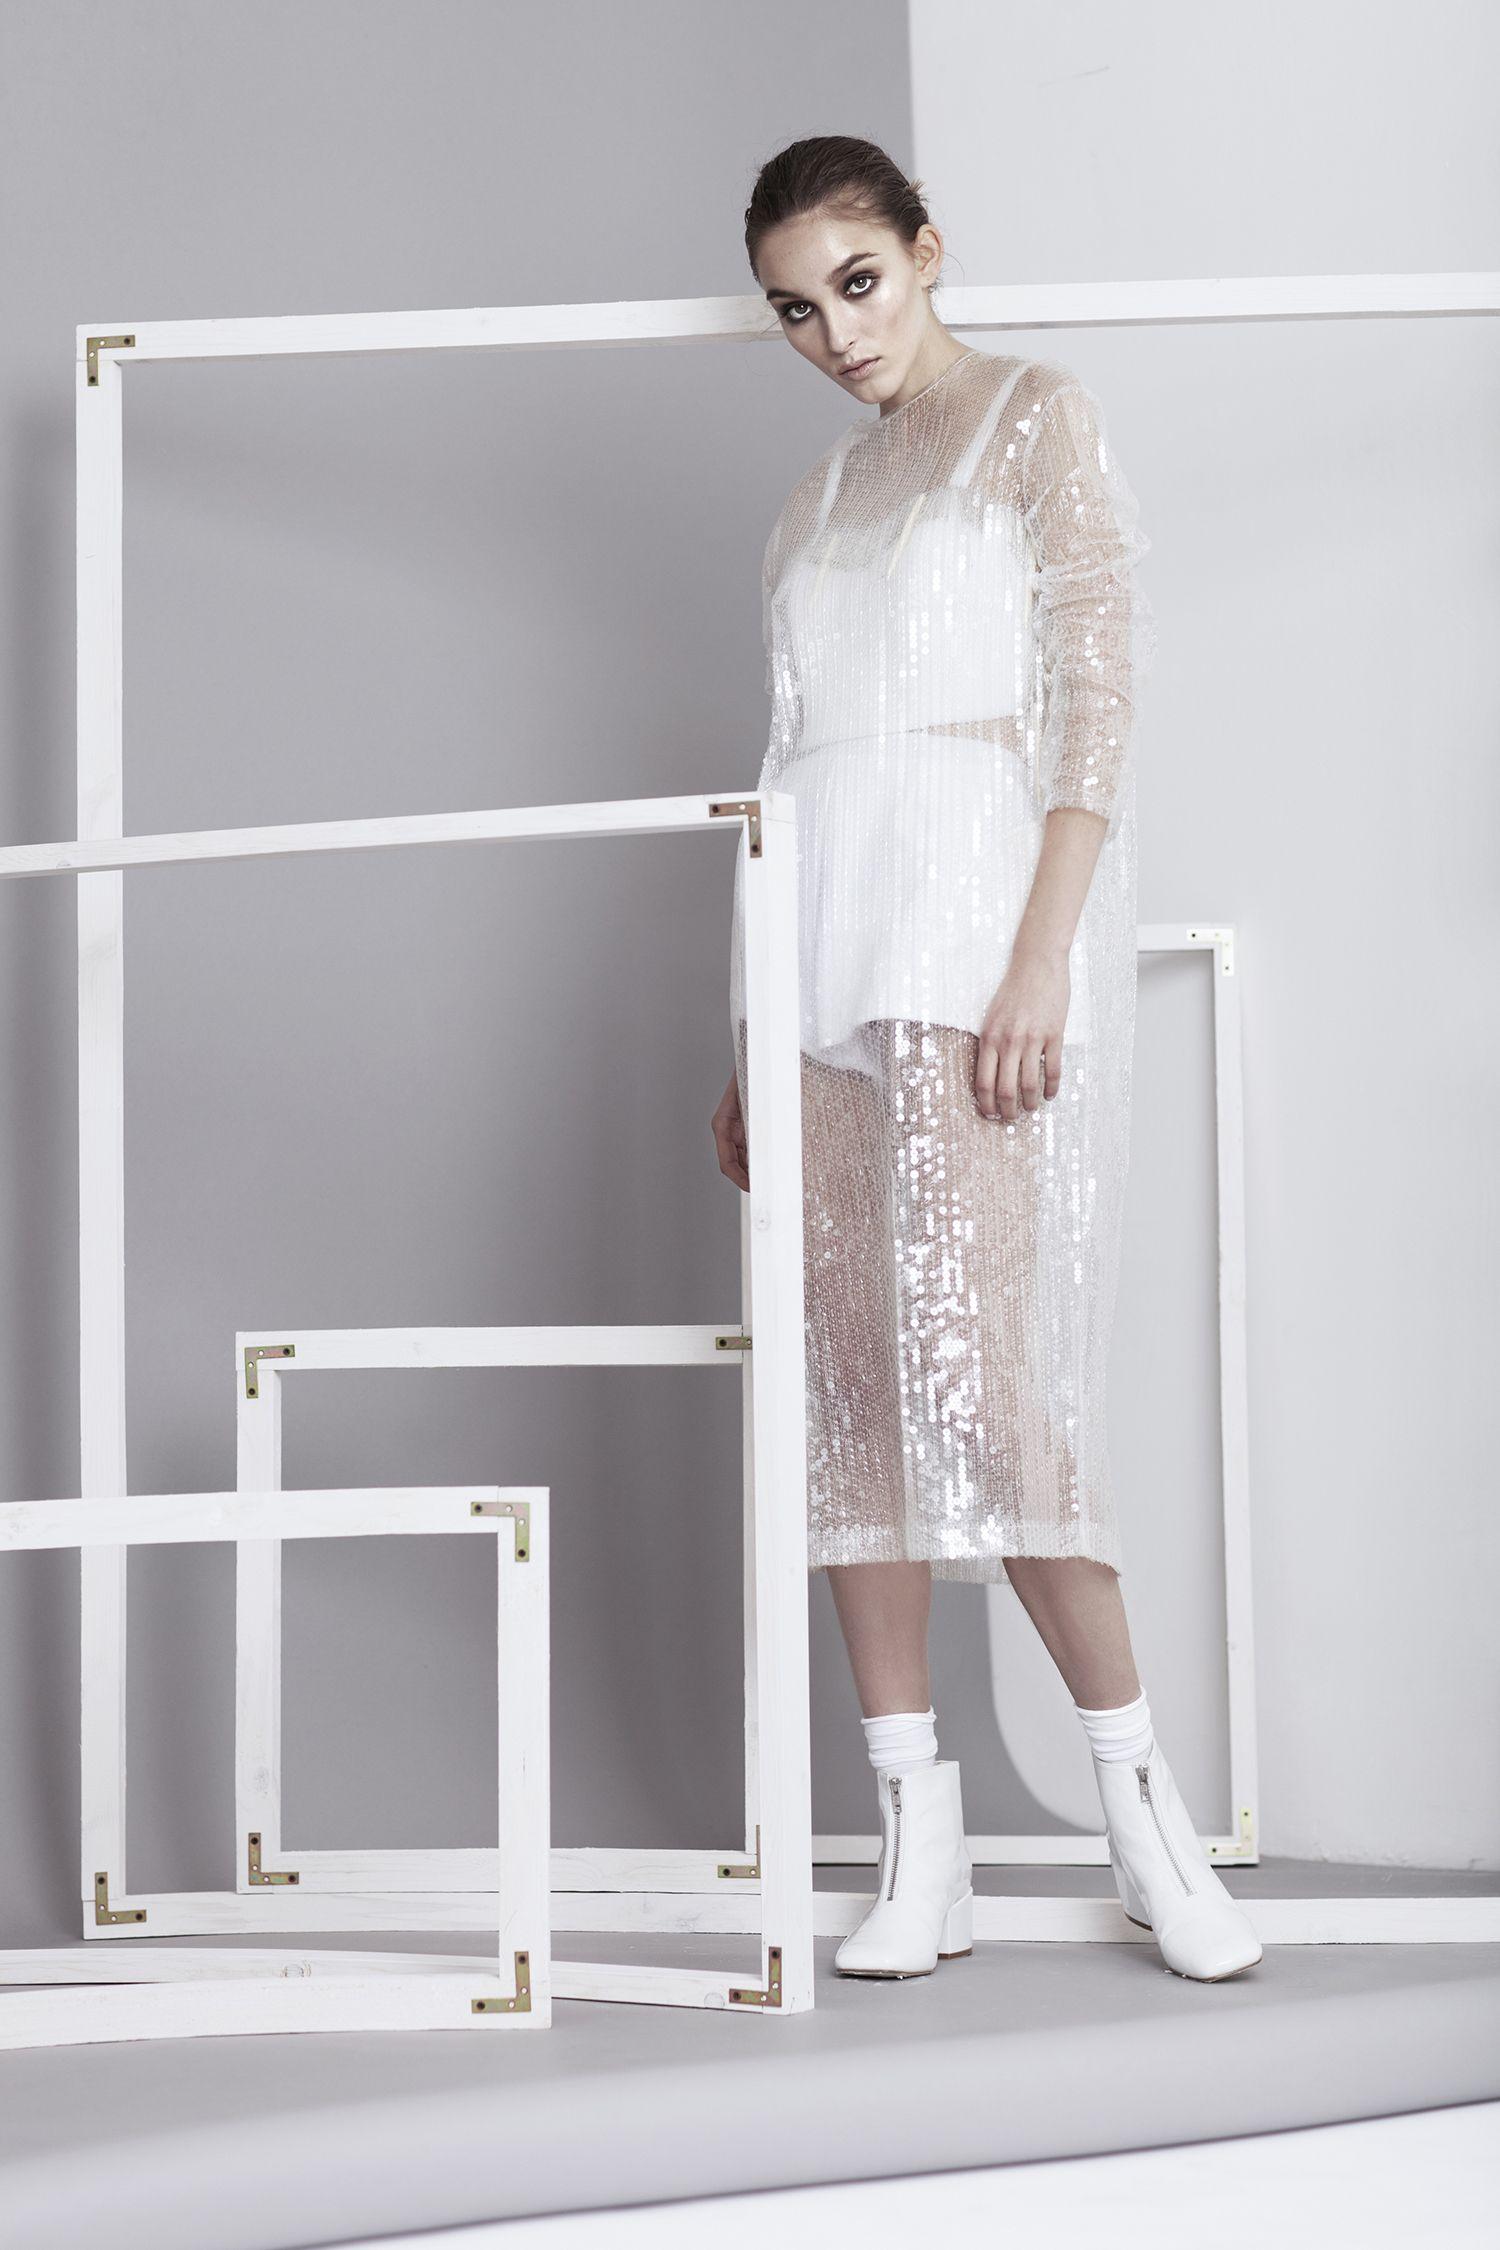 dress ALBERTO ZAMBELLI top MIRYAKI shorts LABEL2 shoes CHEAP MONDAY